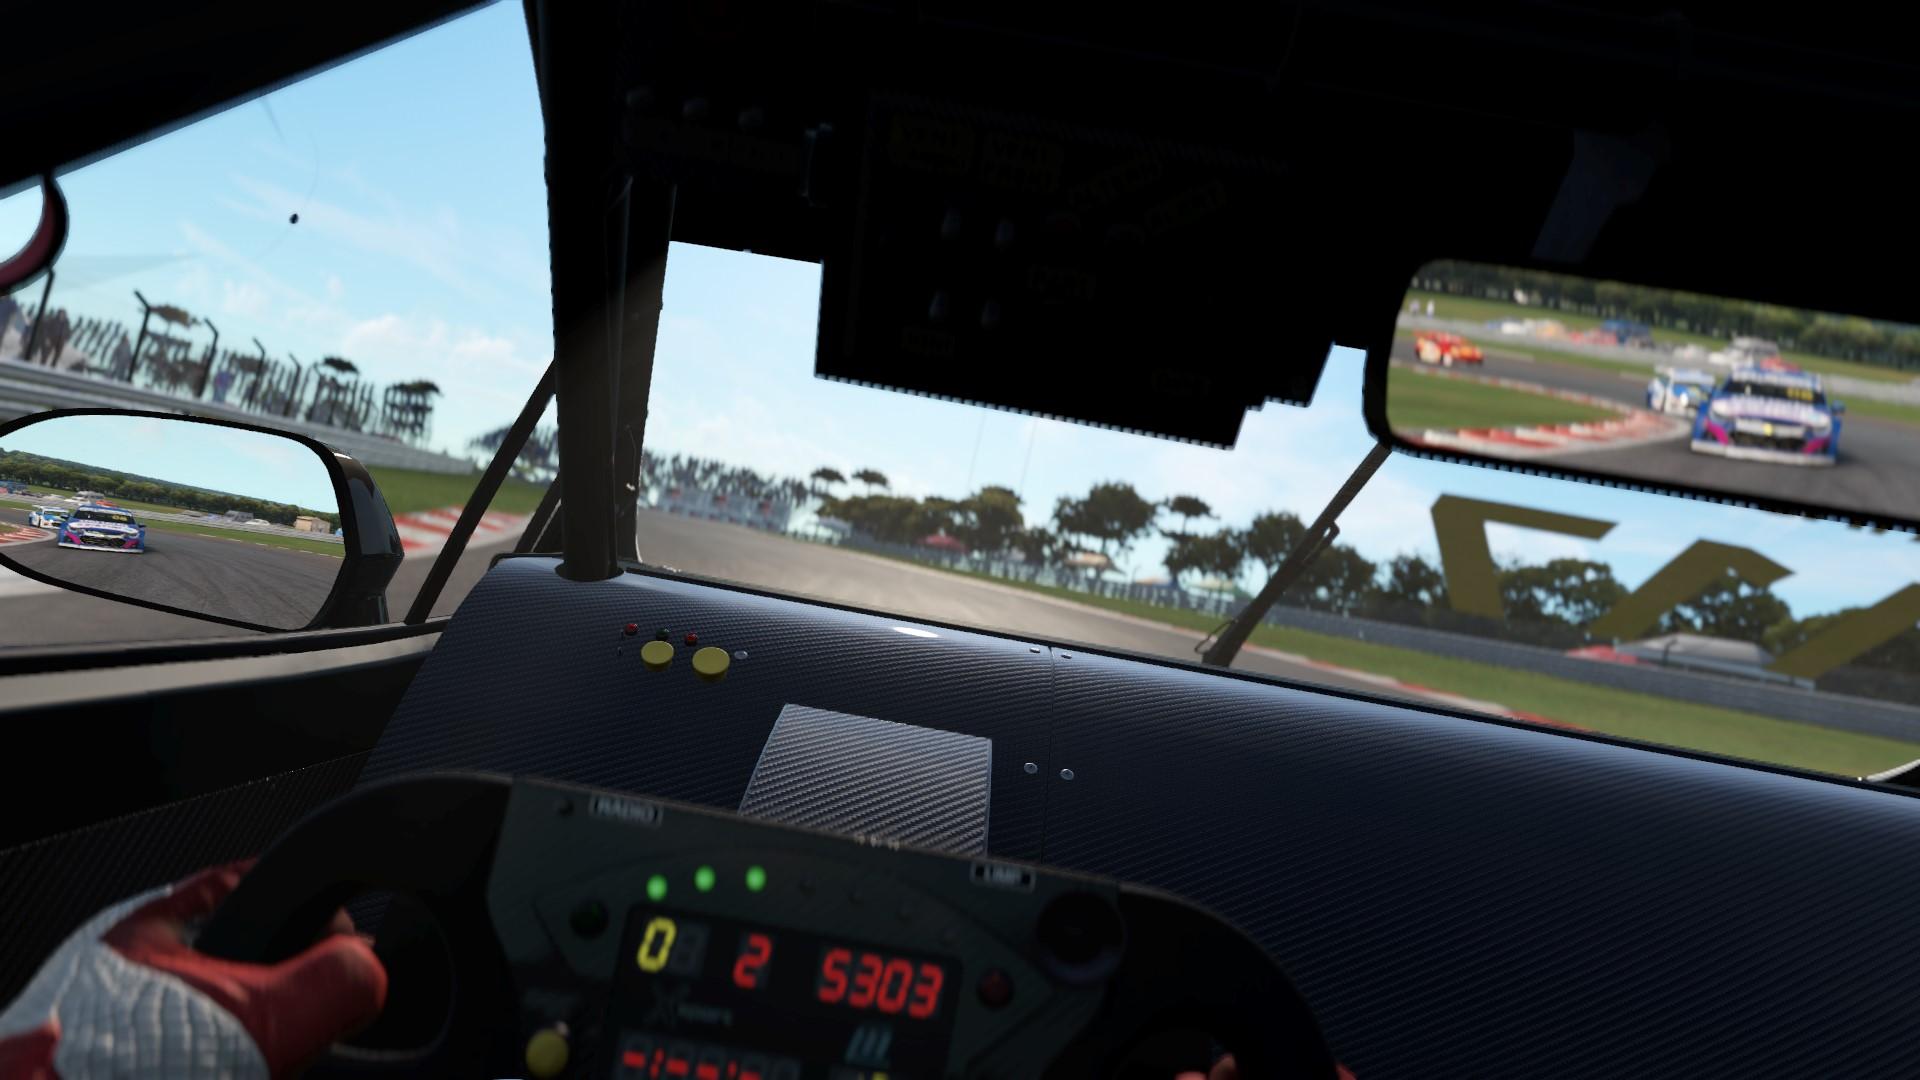 ss093251-jpg Automobilista 2   Share Your Screenshots